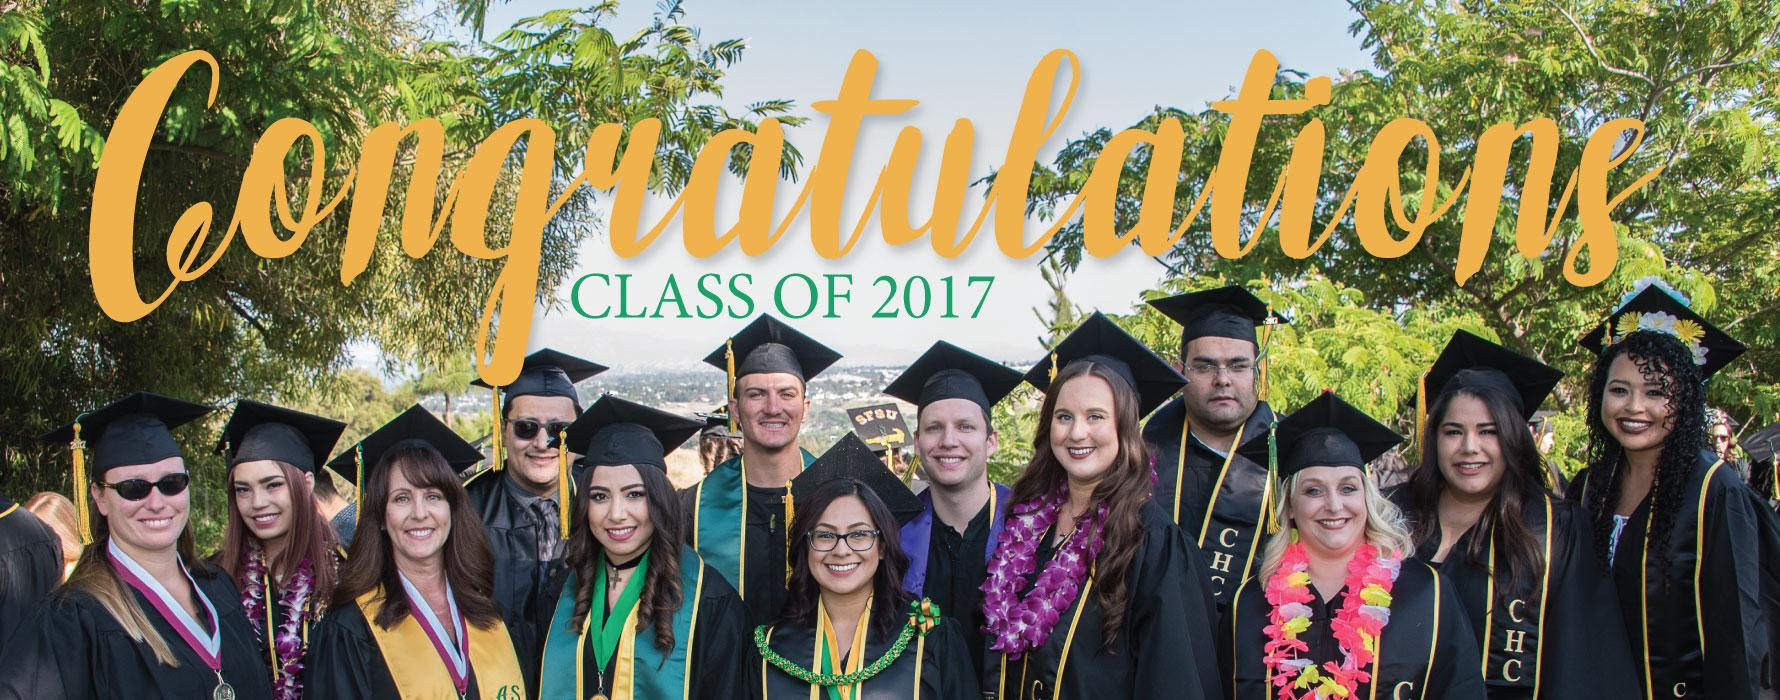 Congratulations Class of 2017